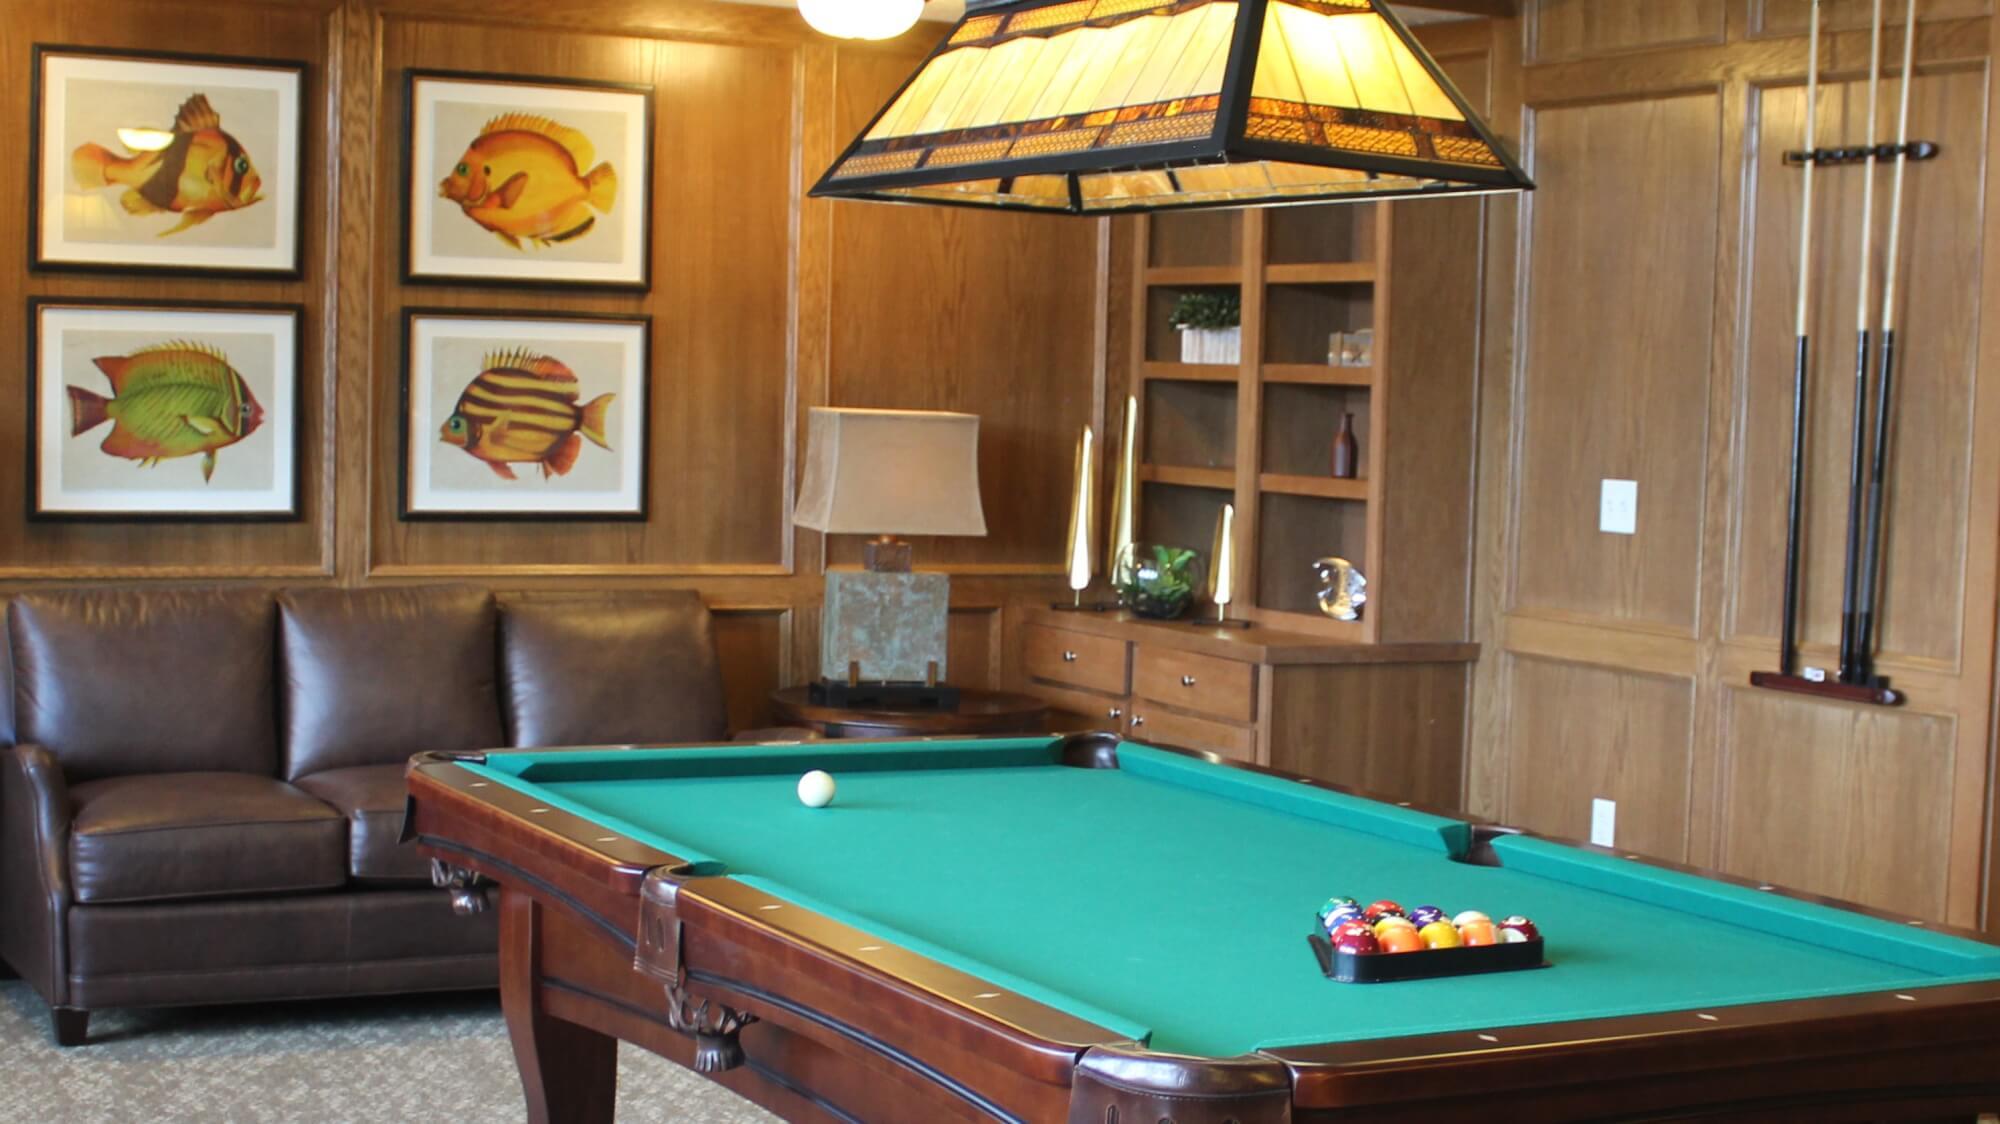 Billiards room at Cahaba Ridge